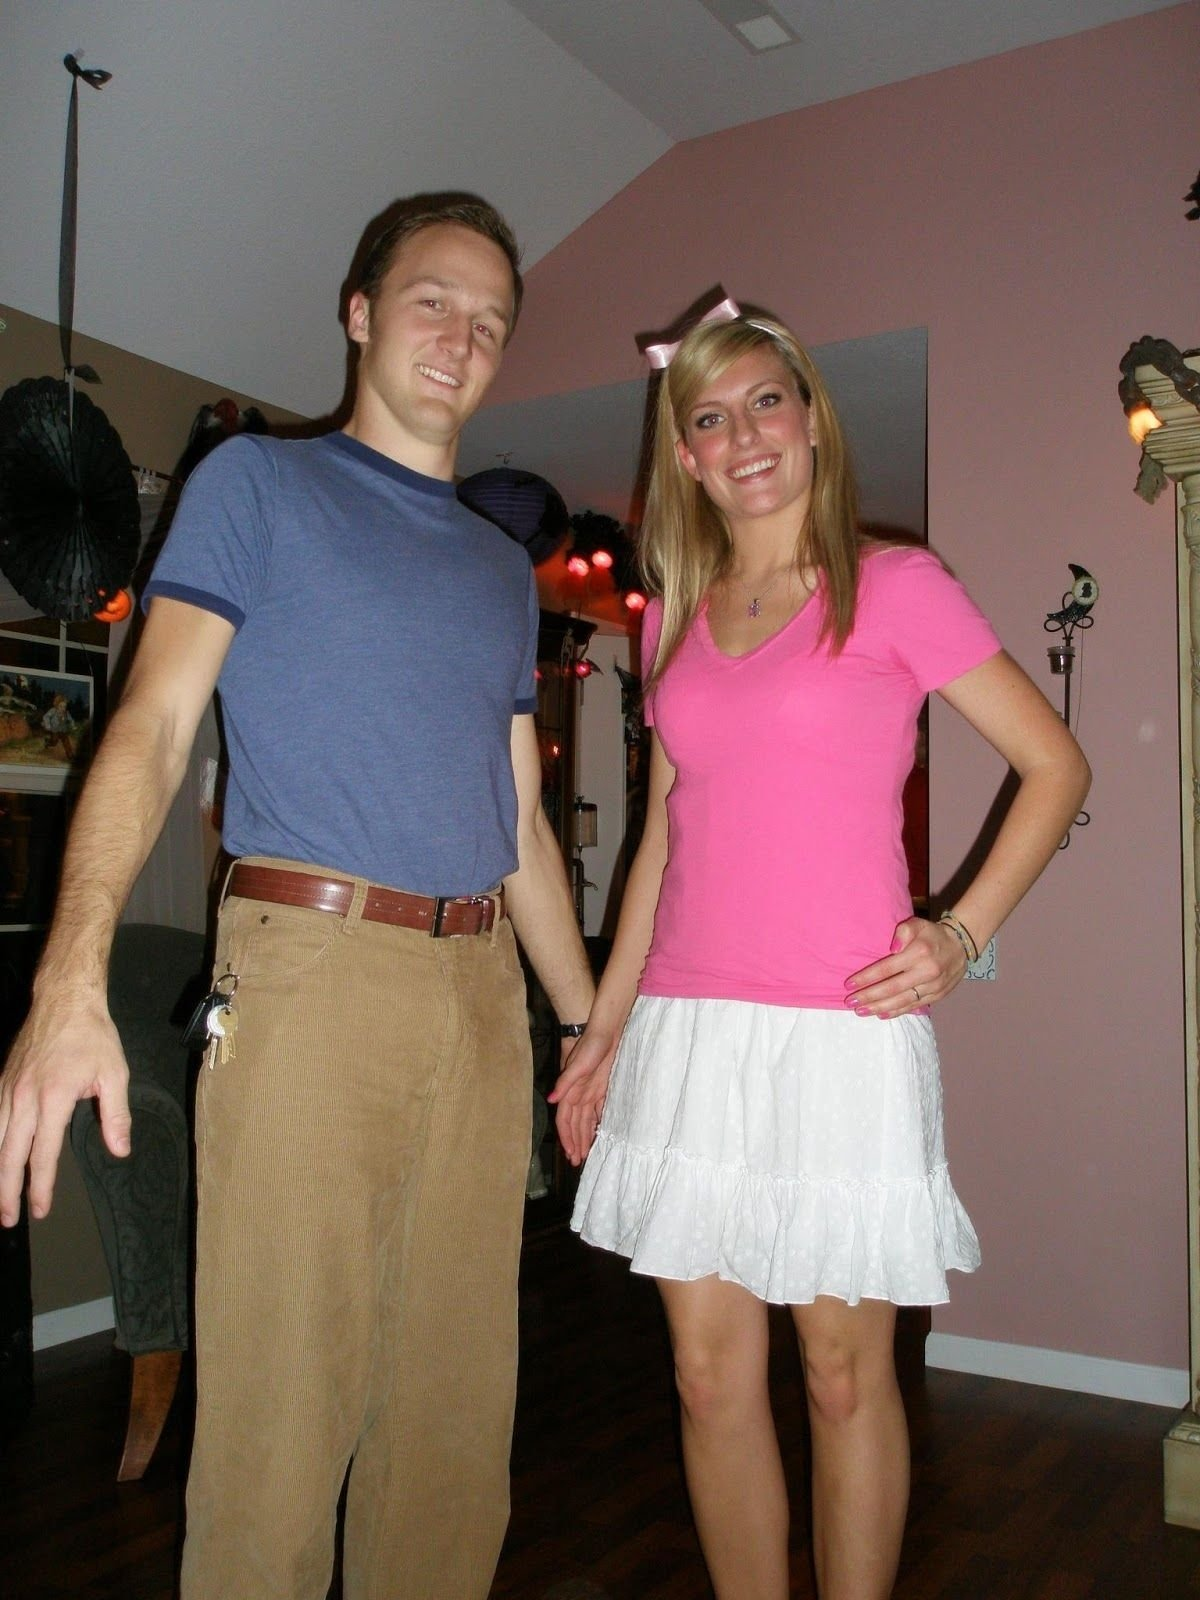 10 Gorgeous Couples Halloween Costumes Ideas Unique photos best creative halloween costume ideas for of desktop full hd 2 2020